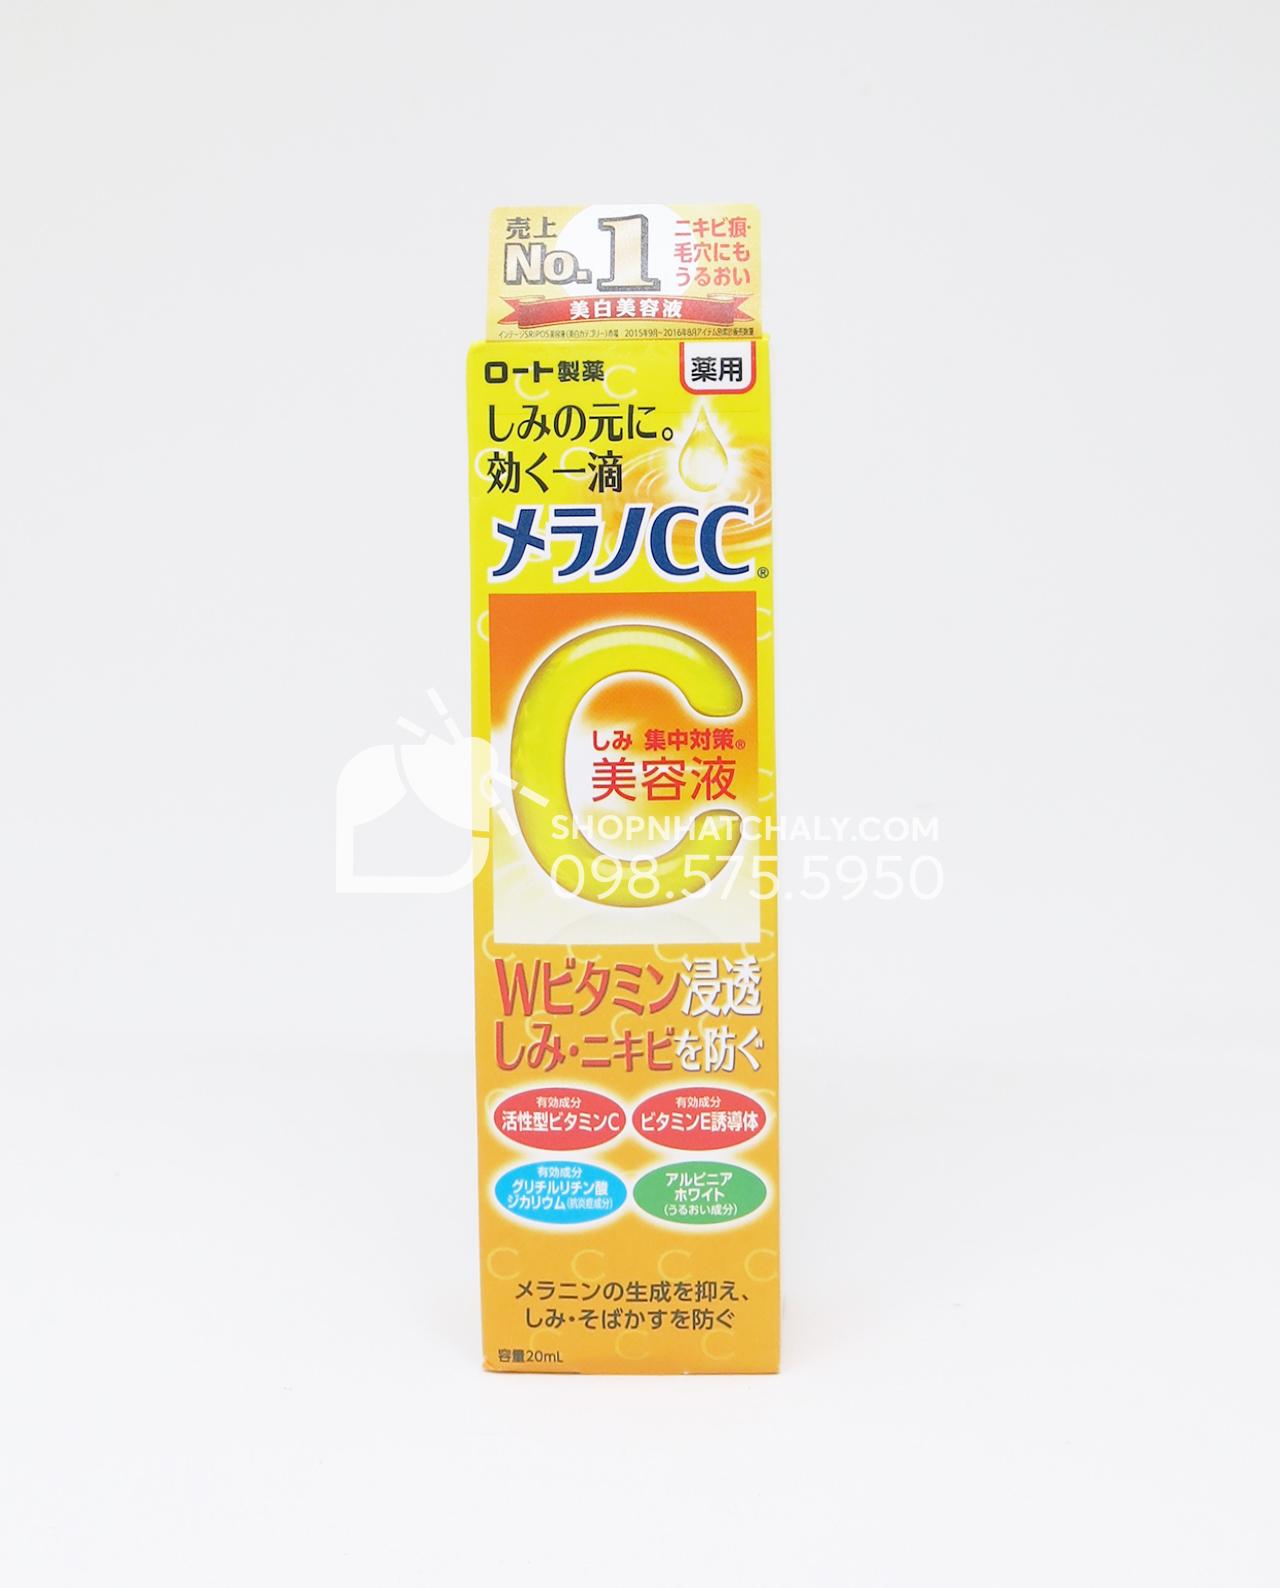 Serum Melano CC Vitamin C Rohto Nhat Ban 20ml mẫu mới